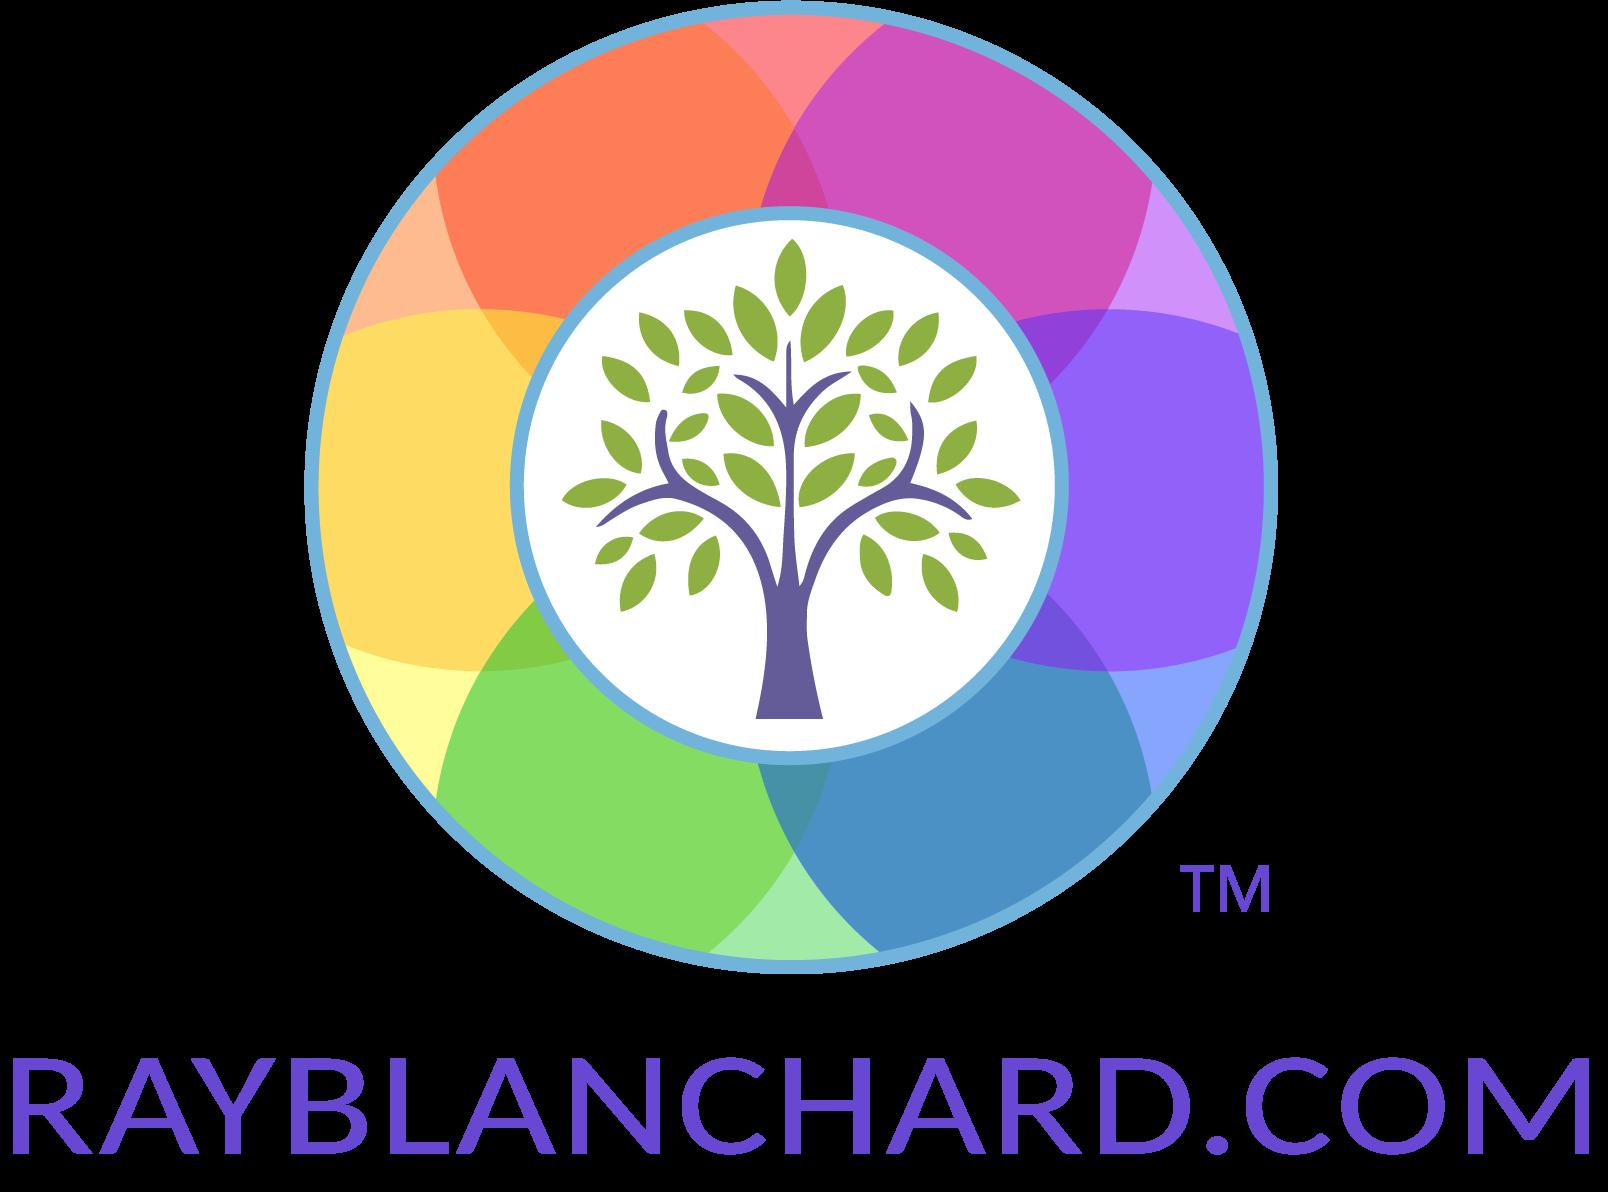 Ray Blanchard